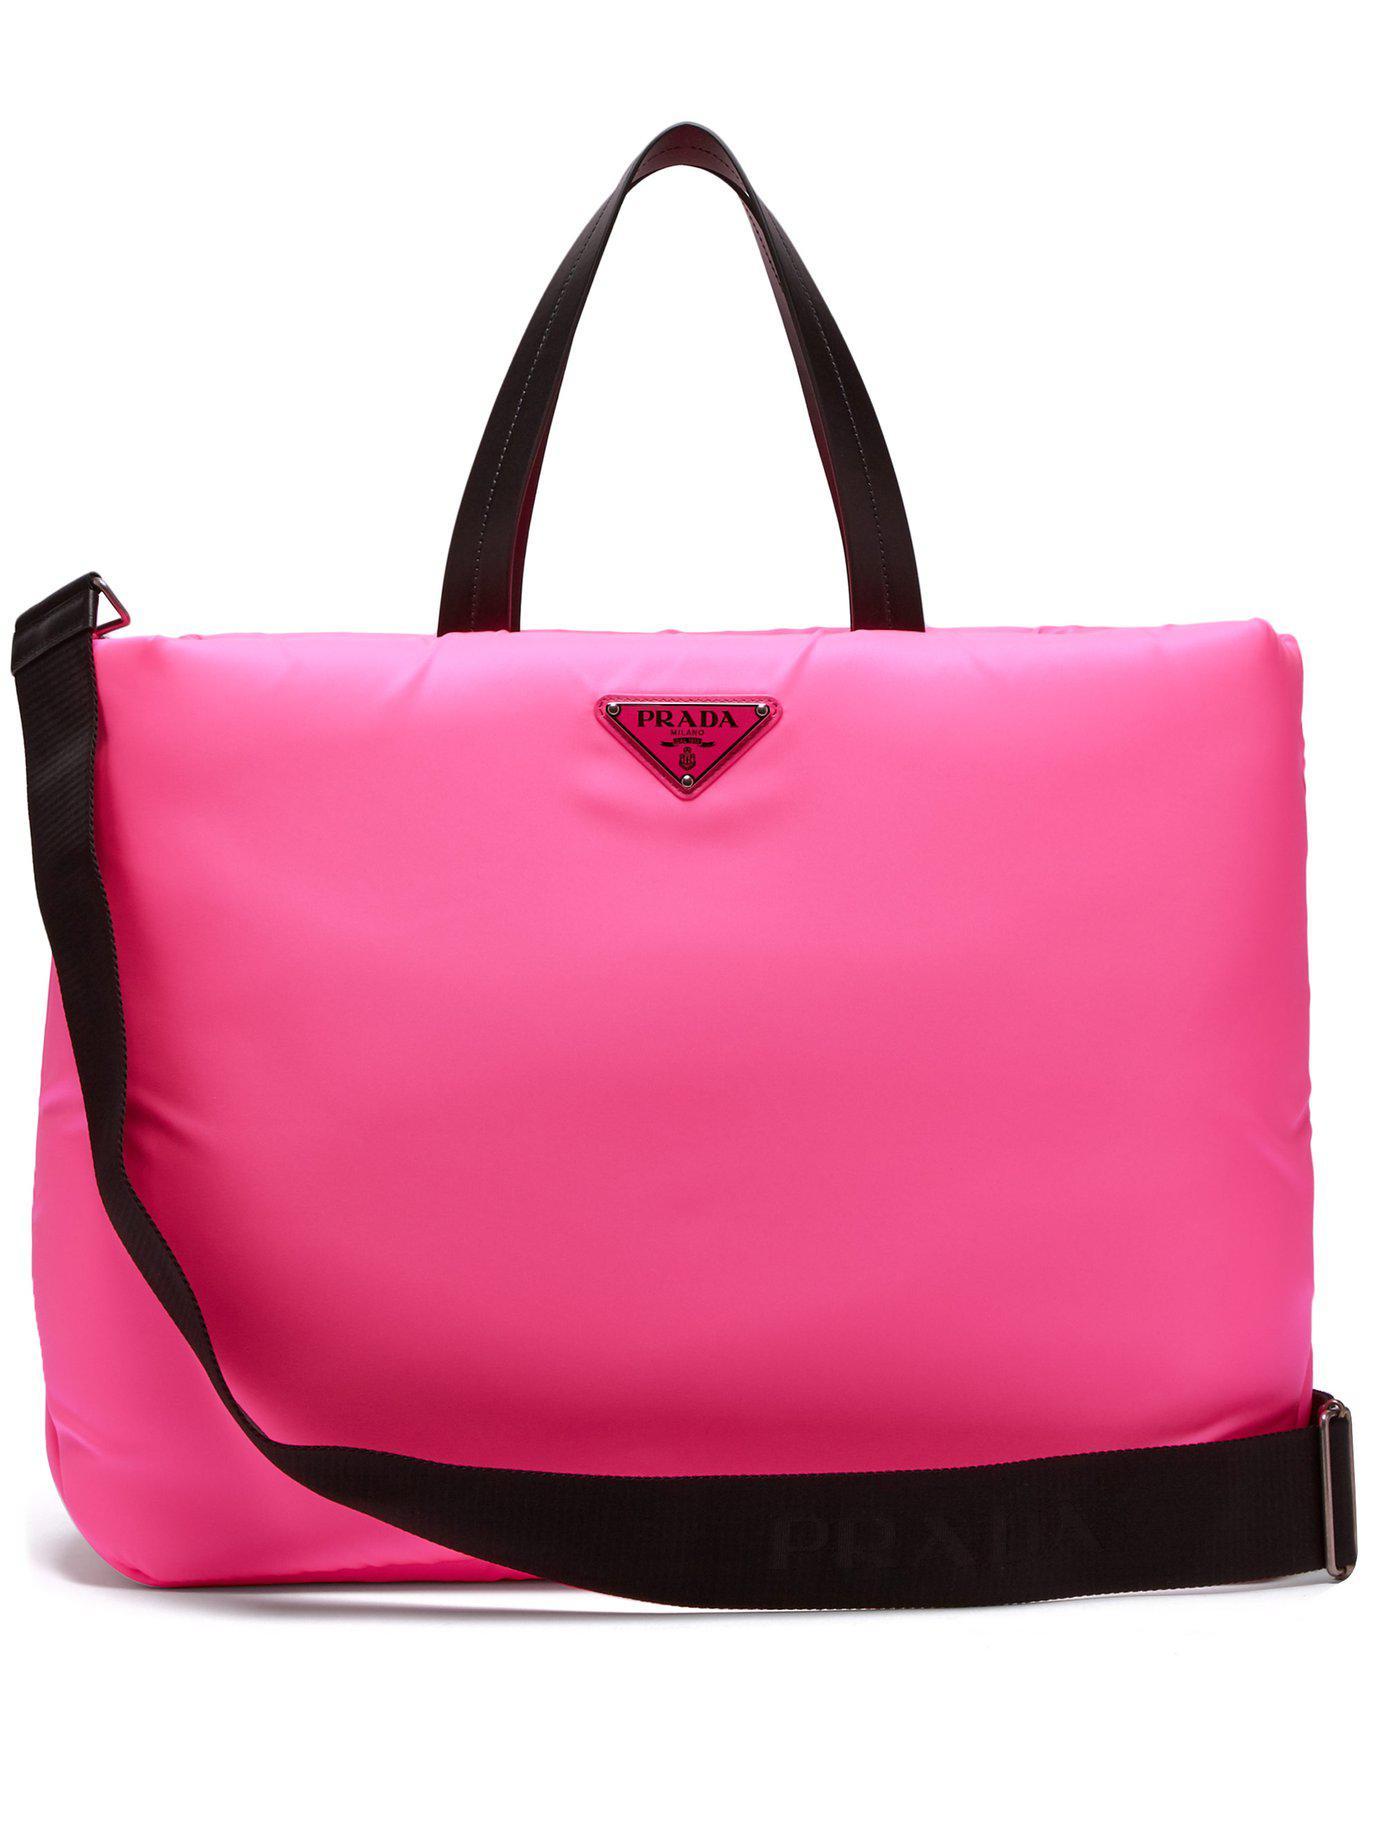 7e9f14ef4288 Lyst - Prada Logo Embellished Padded Nylon Tote Bag in Pink